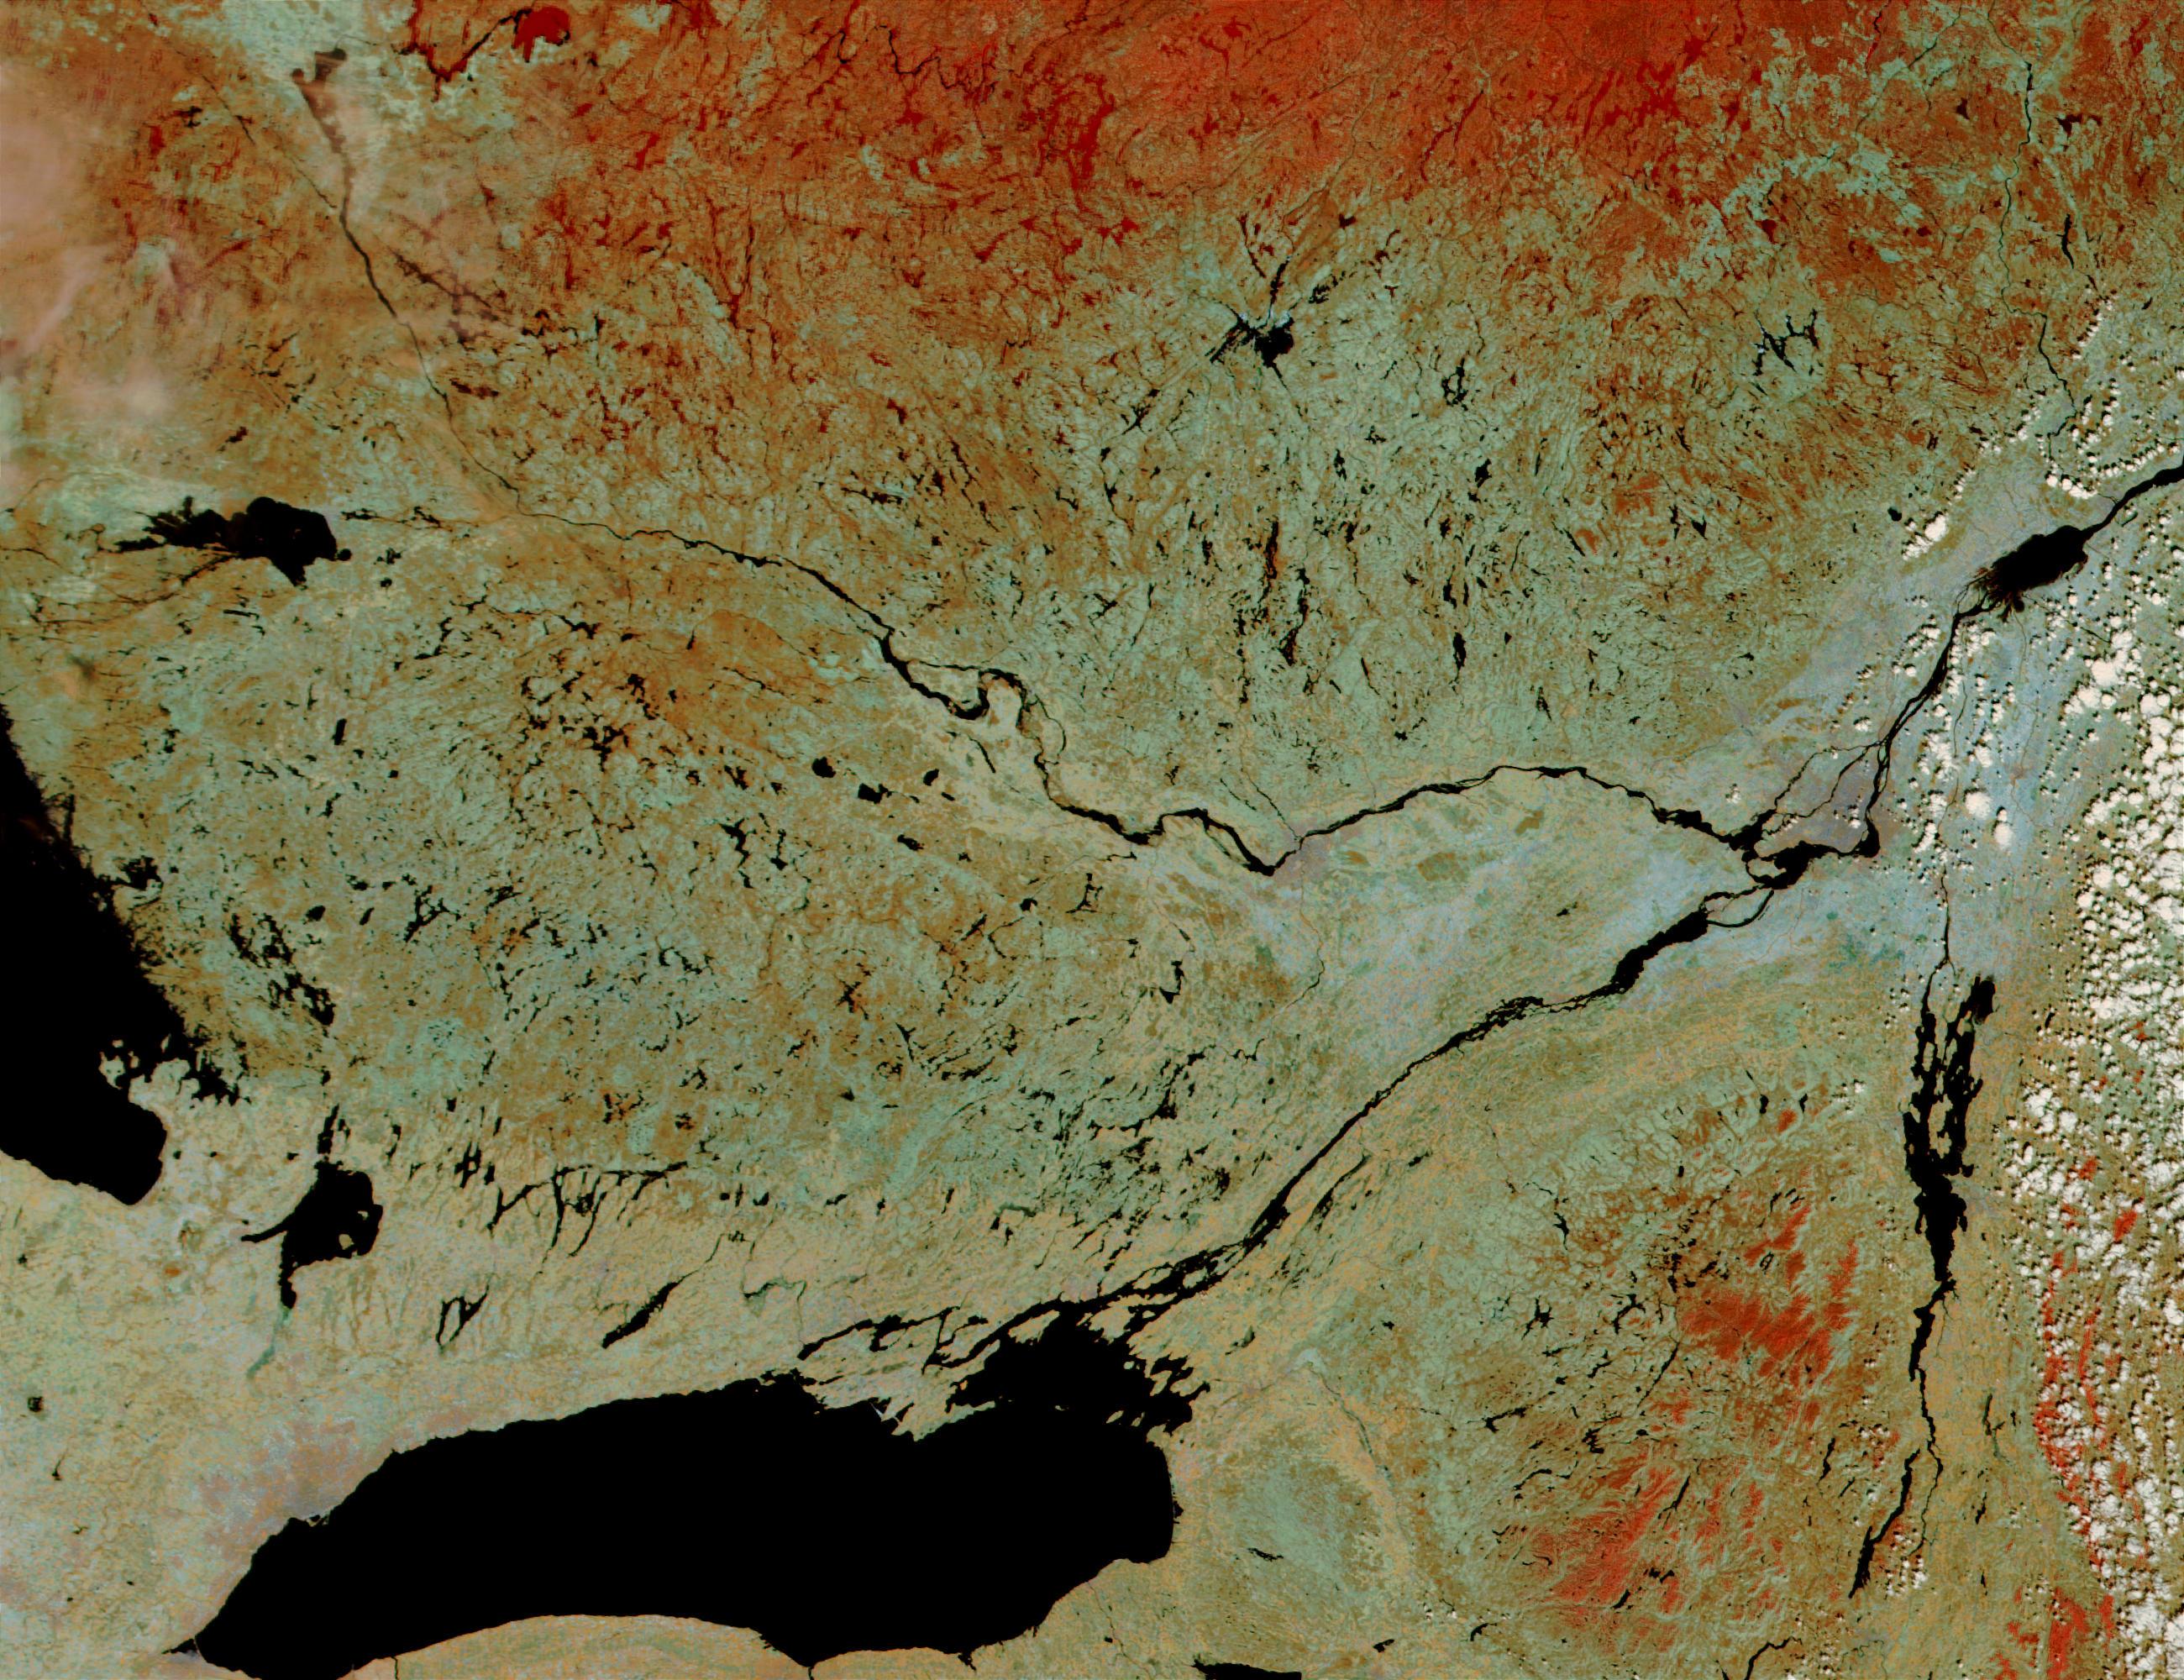 Floods along the Ottawa River, Canada